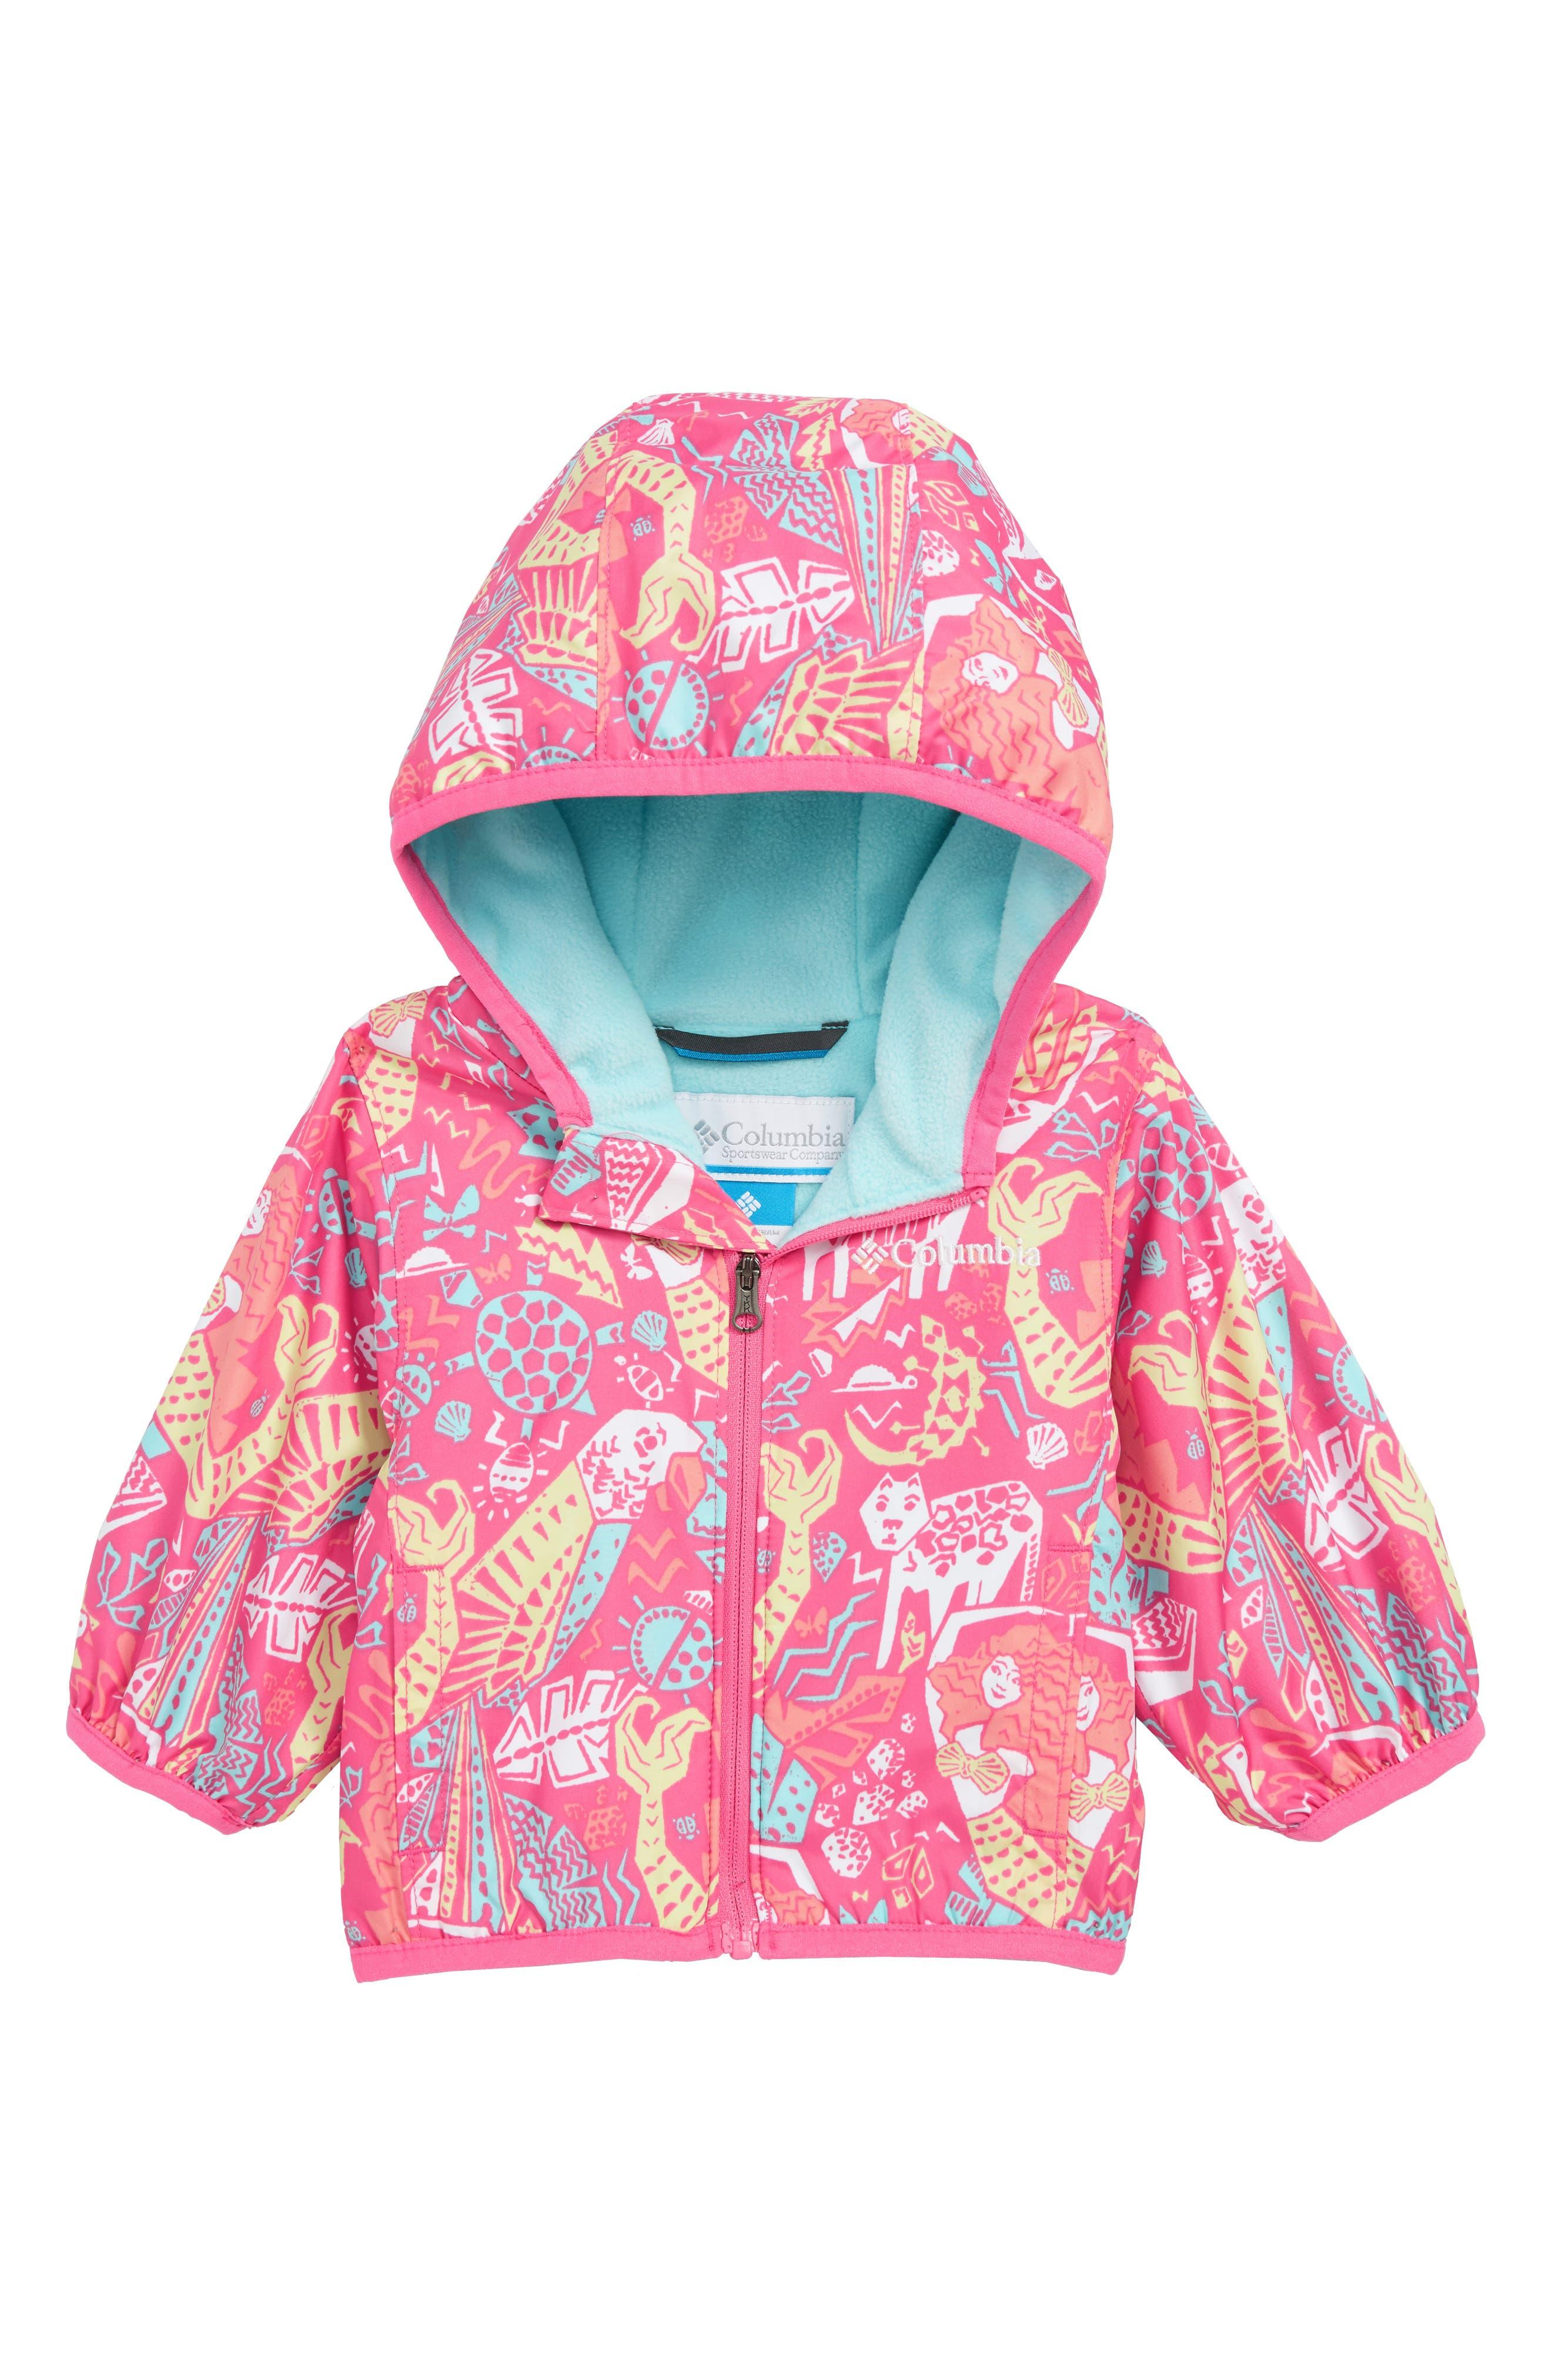 COLUMBIA Mini Pixel Grabber<sup>™</sup> II Water Resistant Hooded Jacket, Main, color, WILD GERANIUM MERMAID JUNGLE